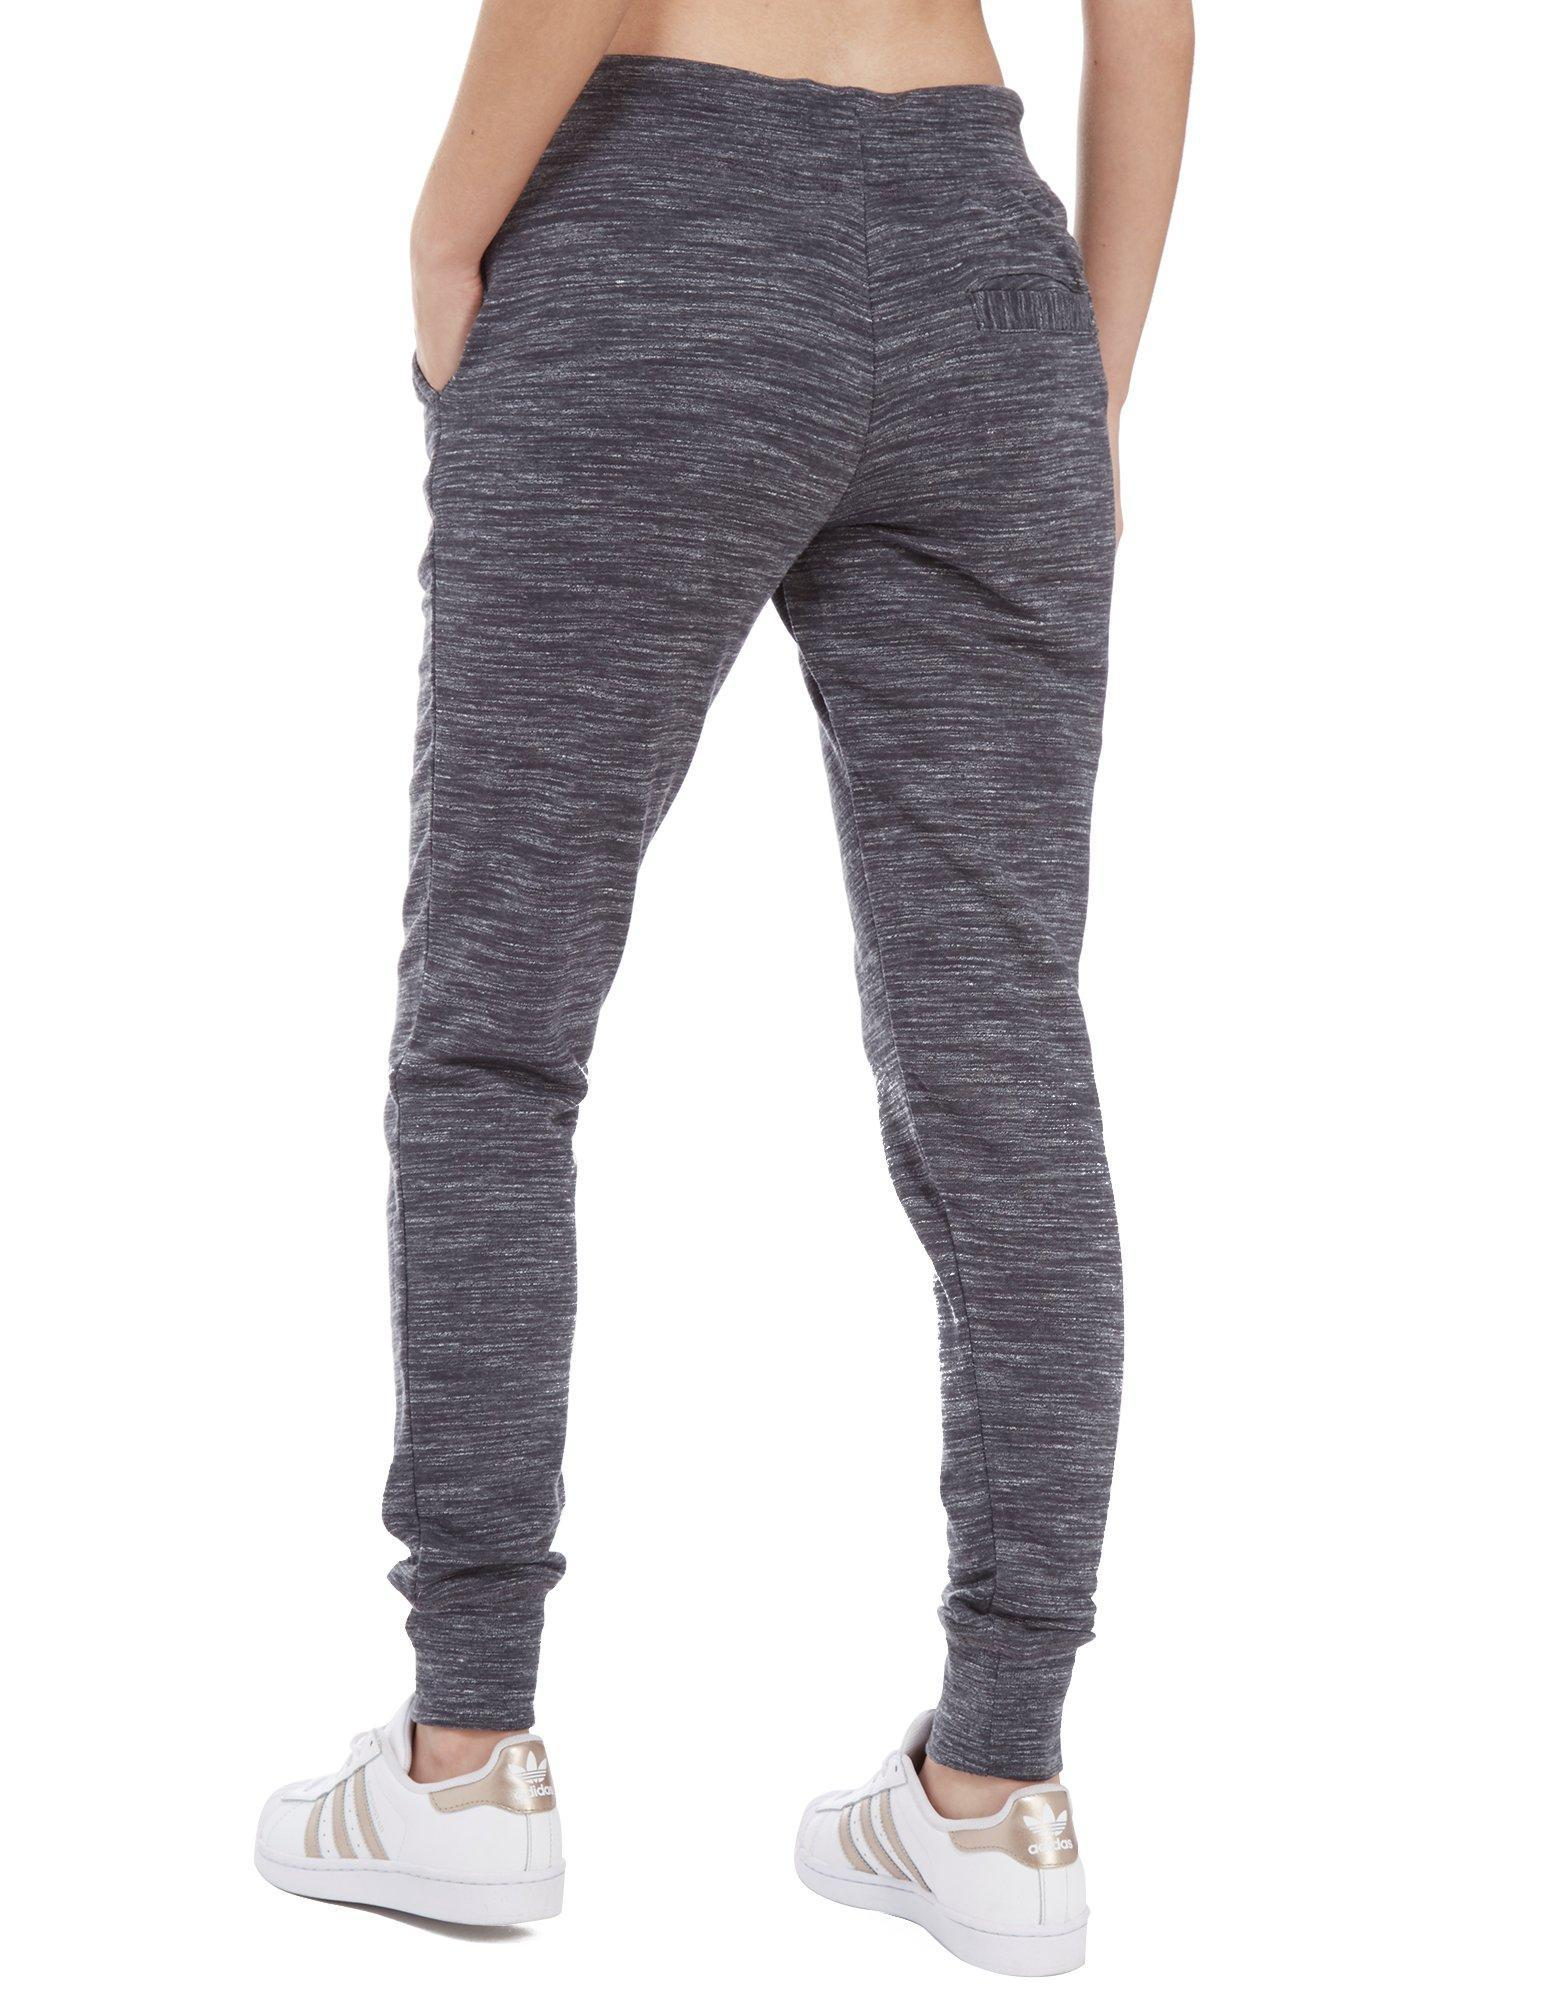 7dbc2b246d68 adidas Originals Premium Spacedye Pants in Gray - Lyst